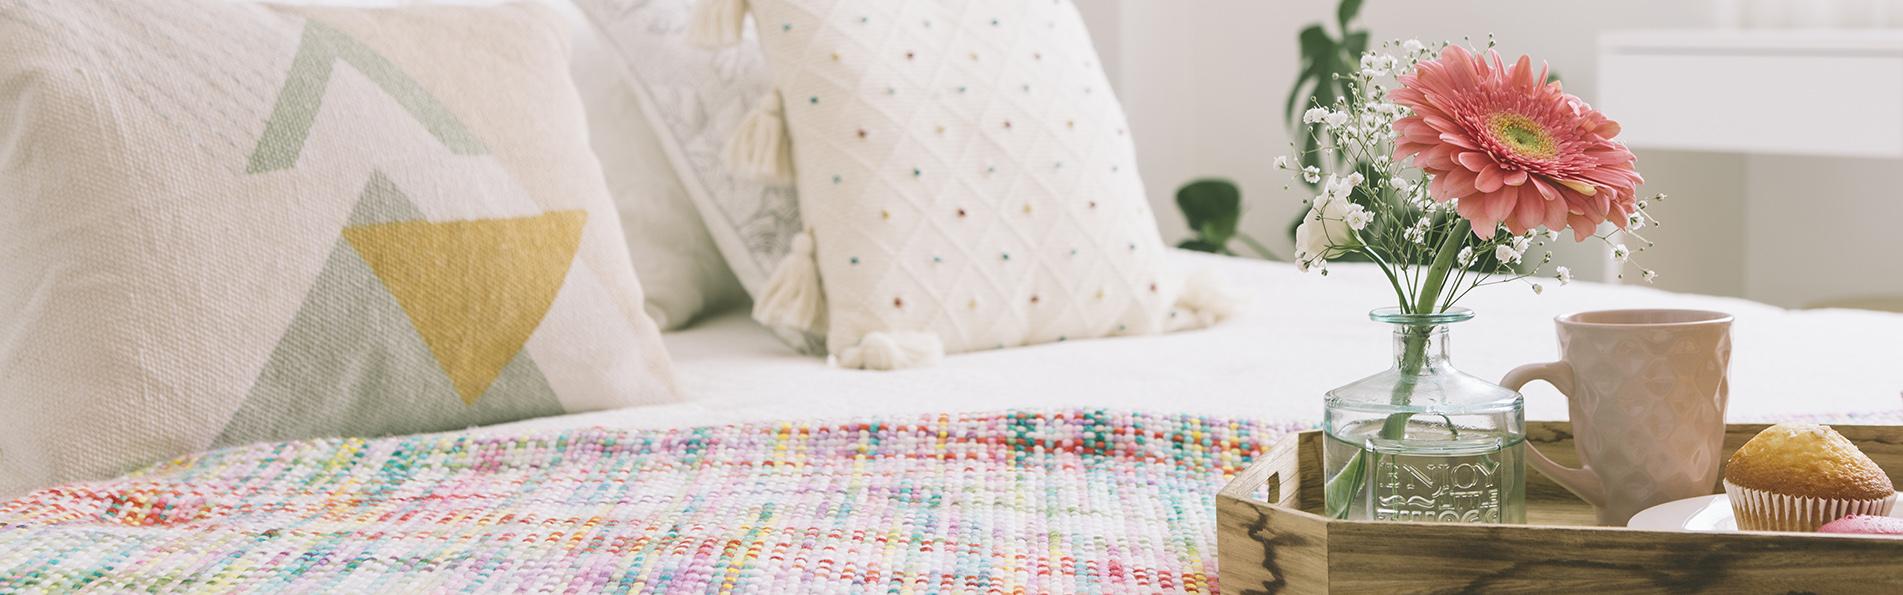 химчистка пледов и одеял